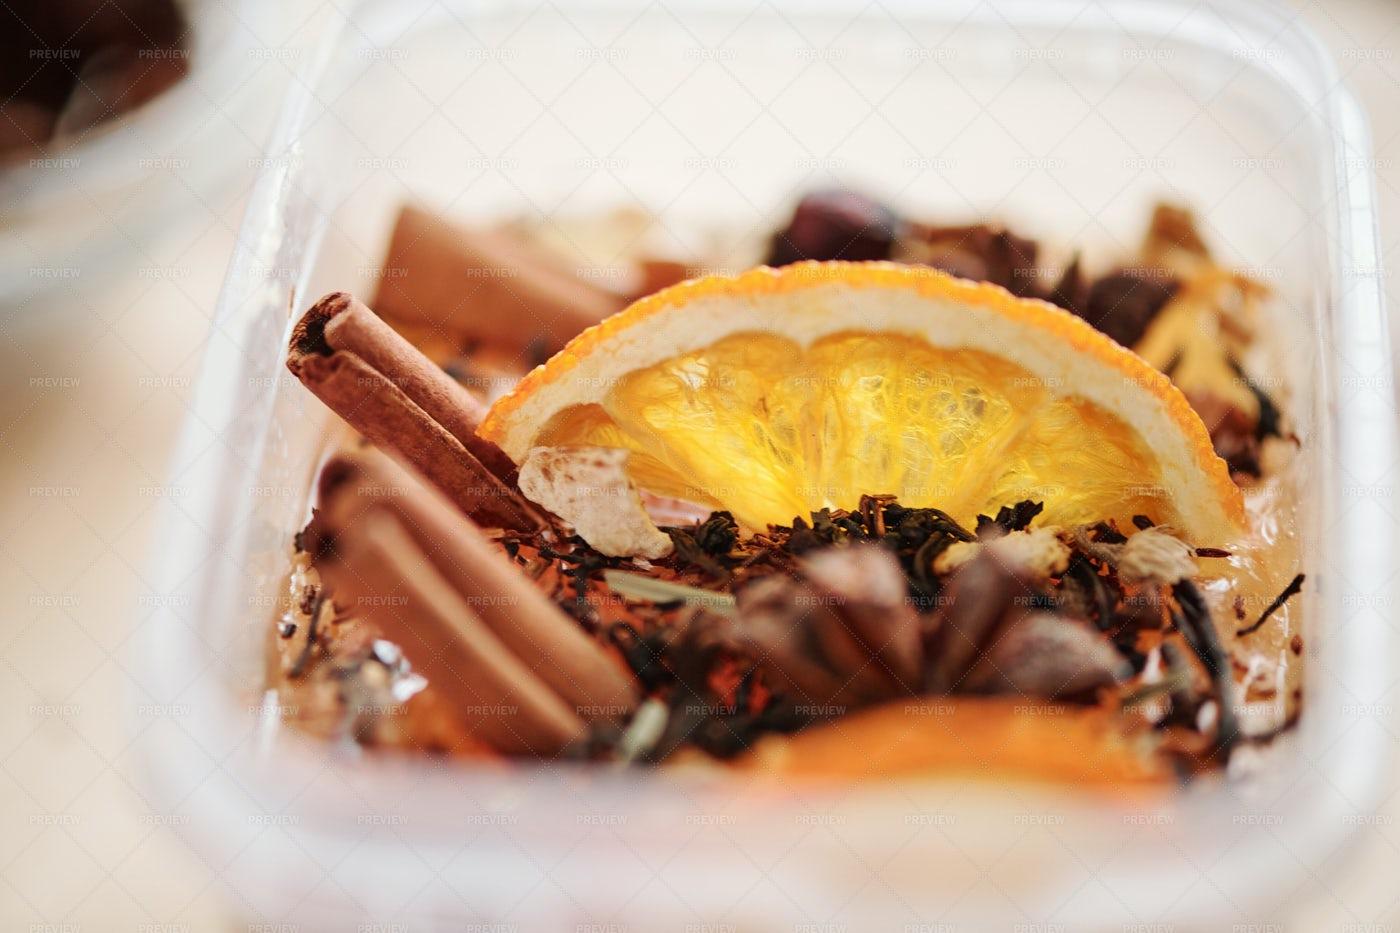 Fresh Orange Slice, Cinnamon Sticks...: Stock Photos